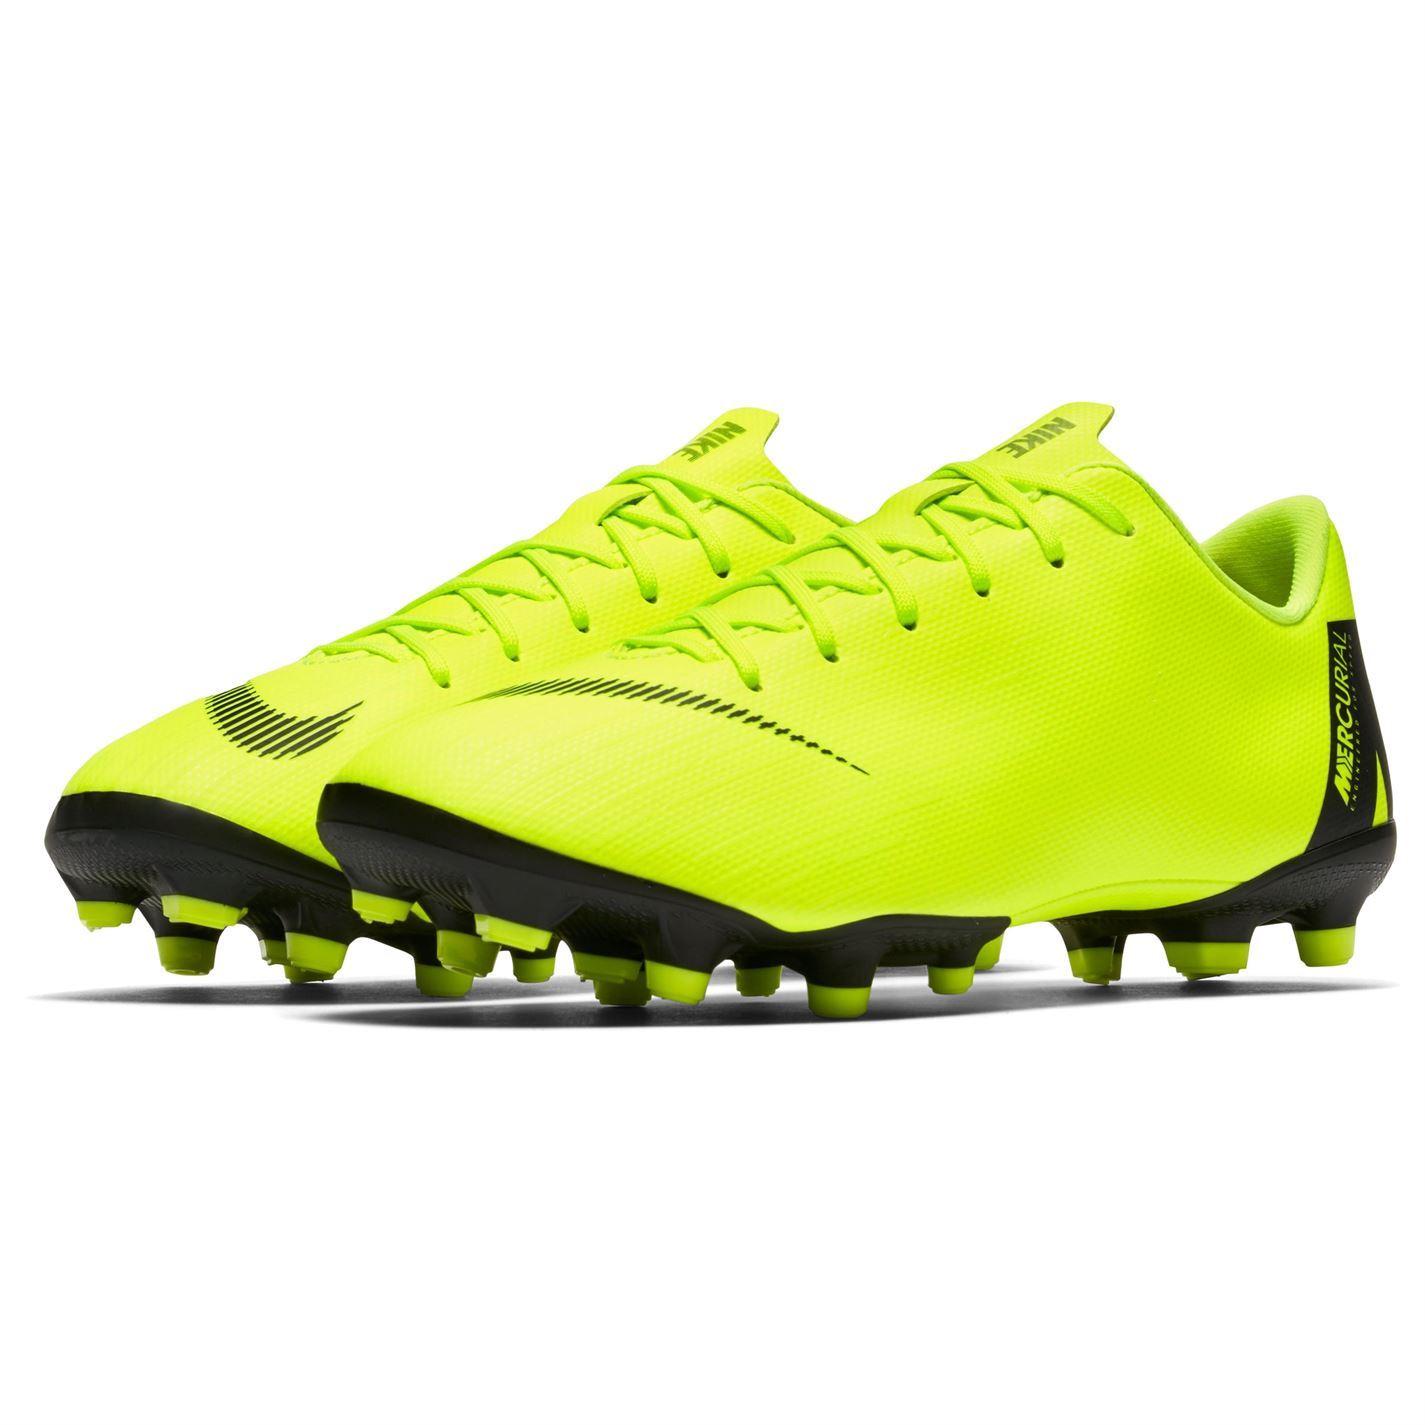 wholesale dealer 11633 ddfdf Details about Nike Mercurial Vapor Academy Firm Ground FG Football Boots  Juniors Soccer Cleats